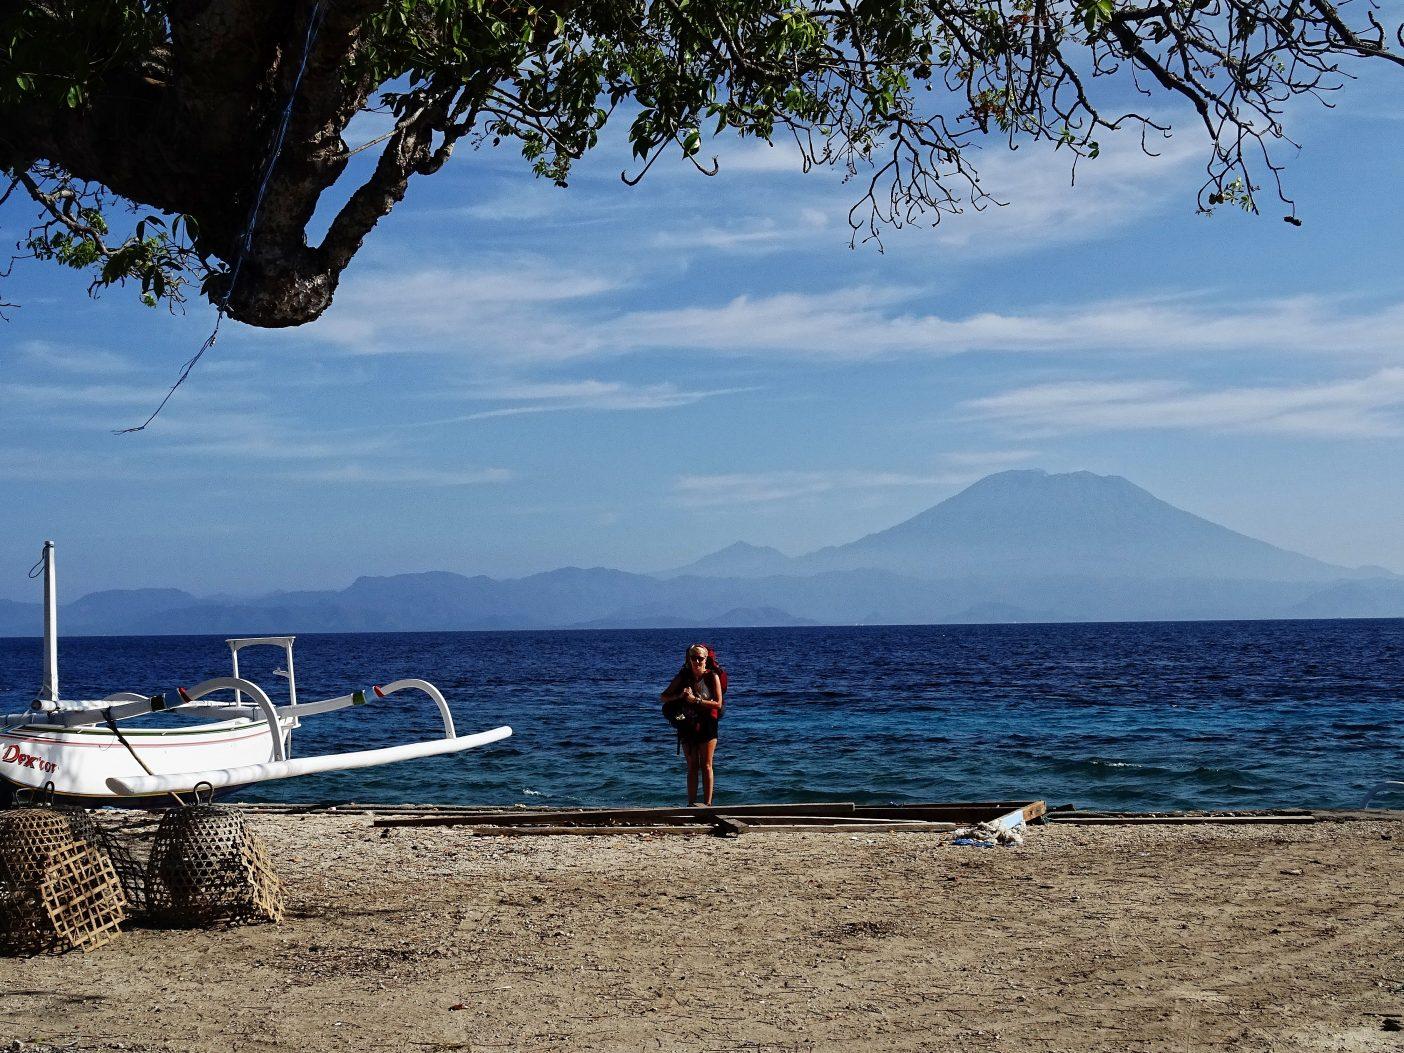 Girl backpacking on tropical island